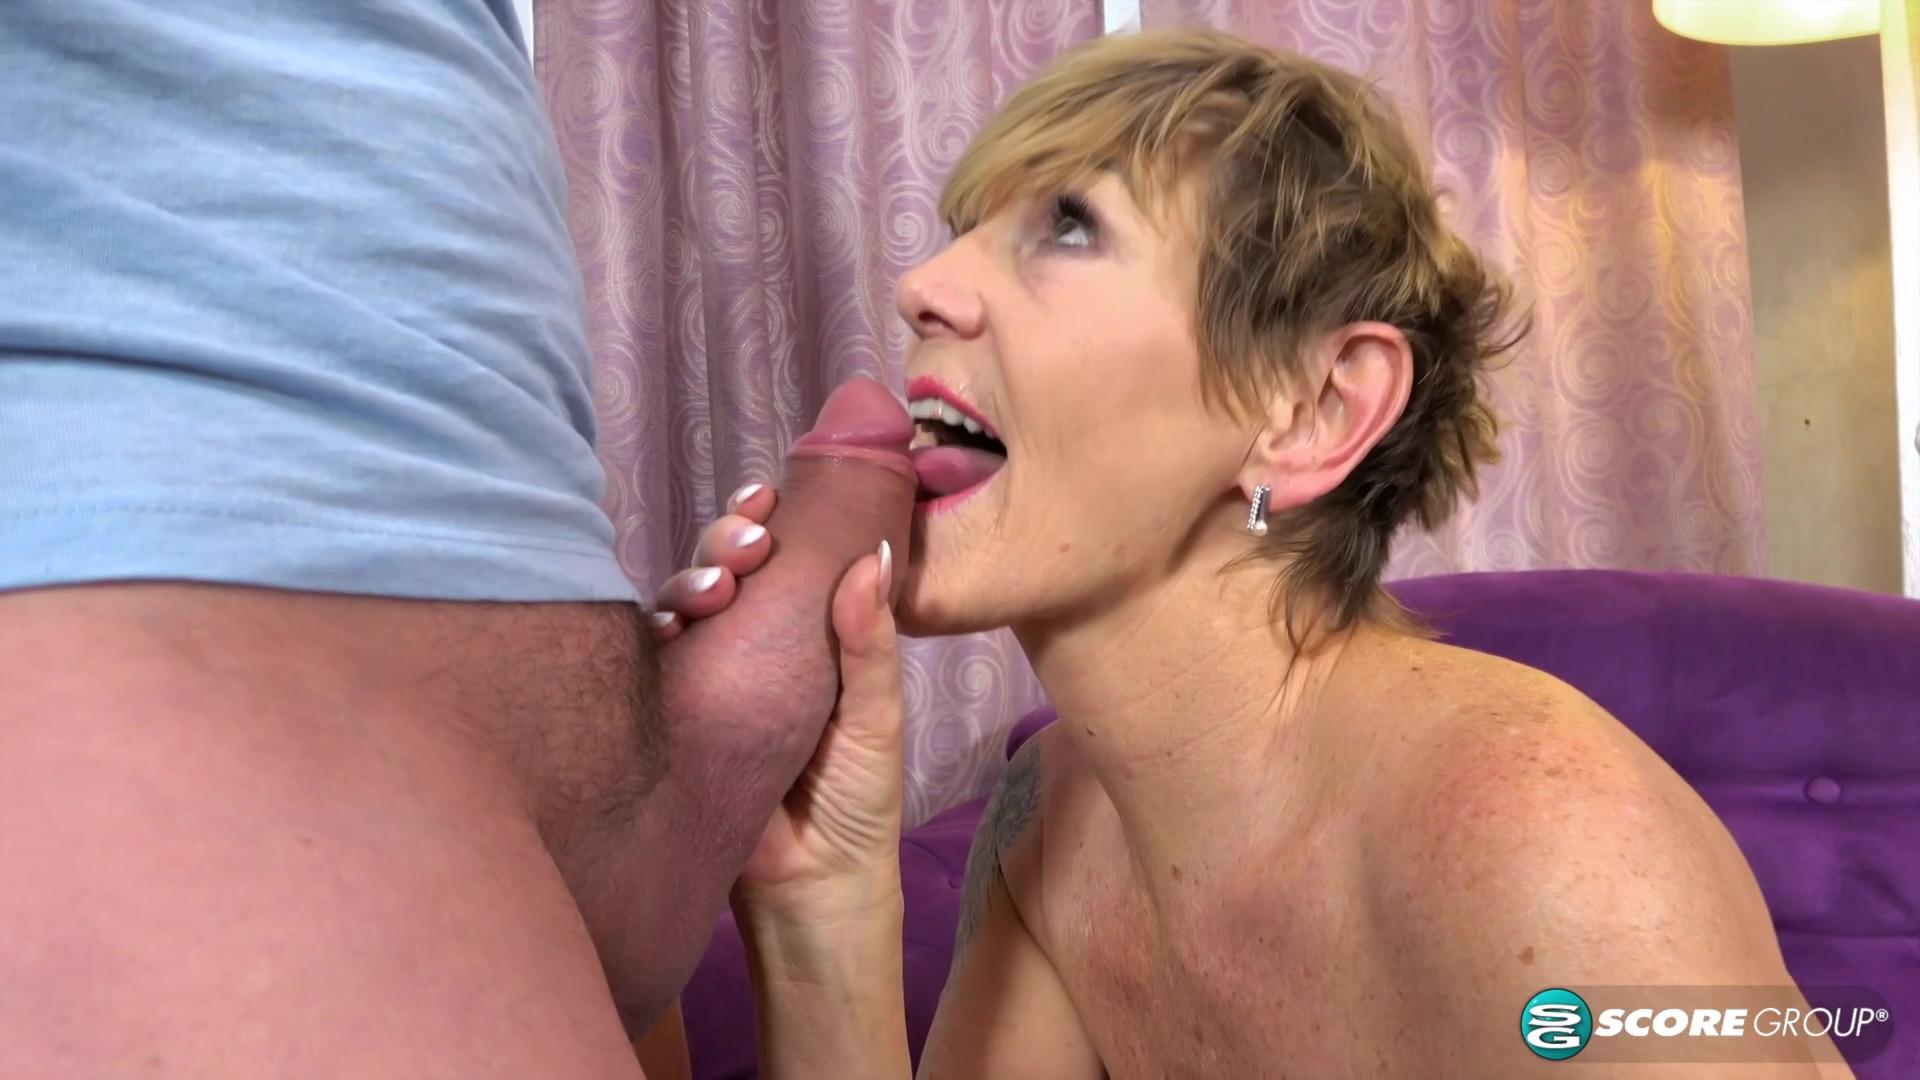 Video 1555280604: maggie green, big tits ass mature, big ass tits hd, big ass stockings